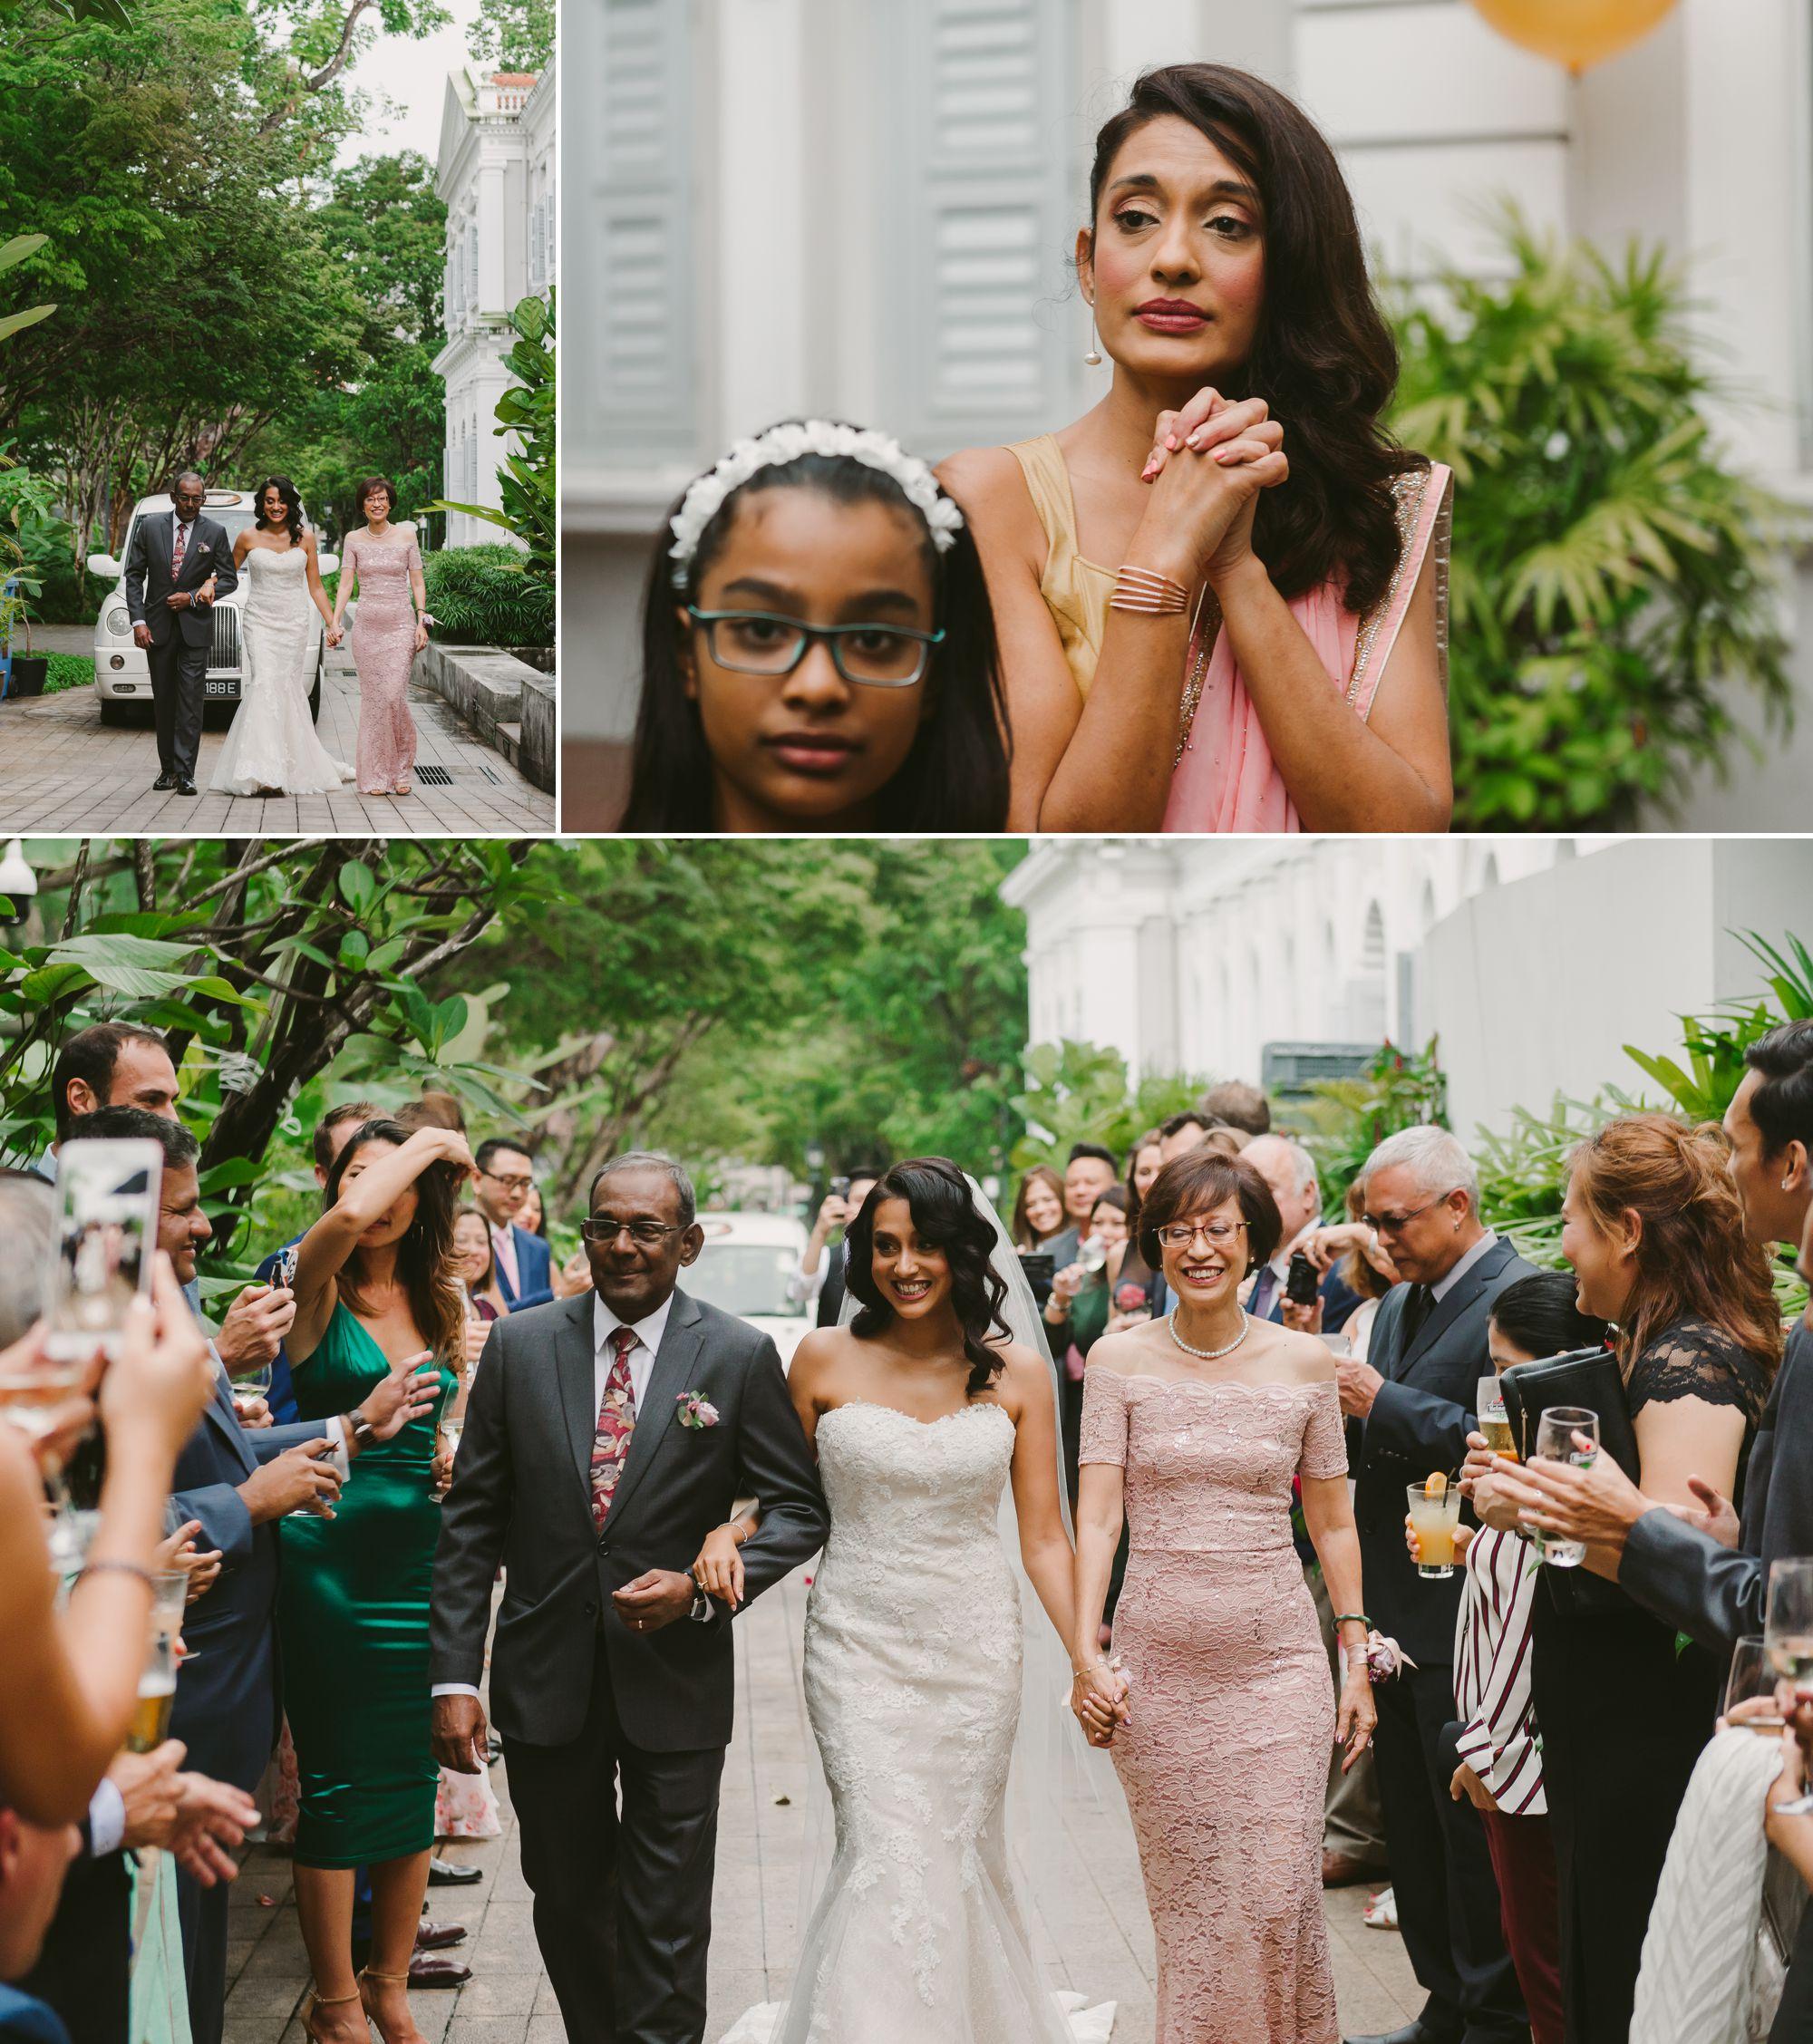 wedding_day_photography_ 12.jpg